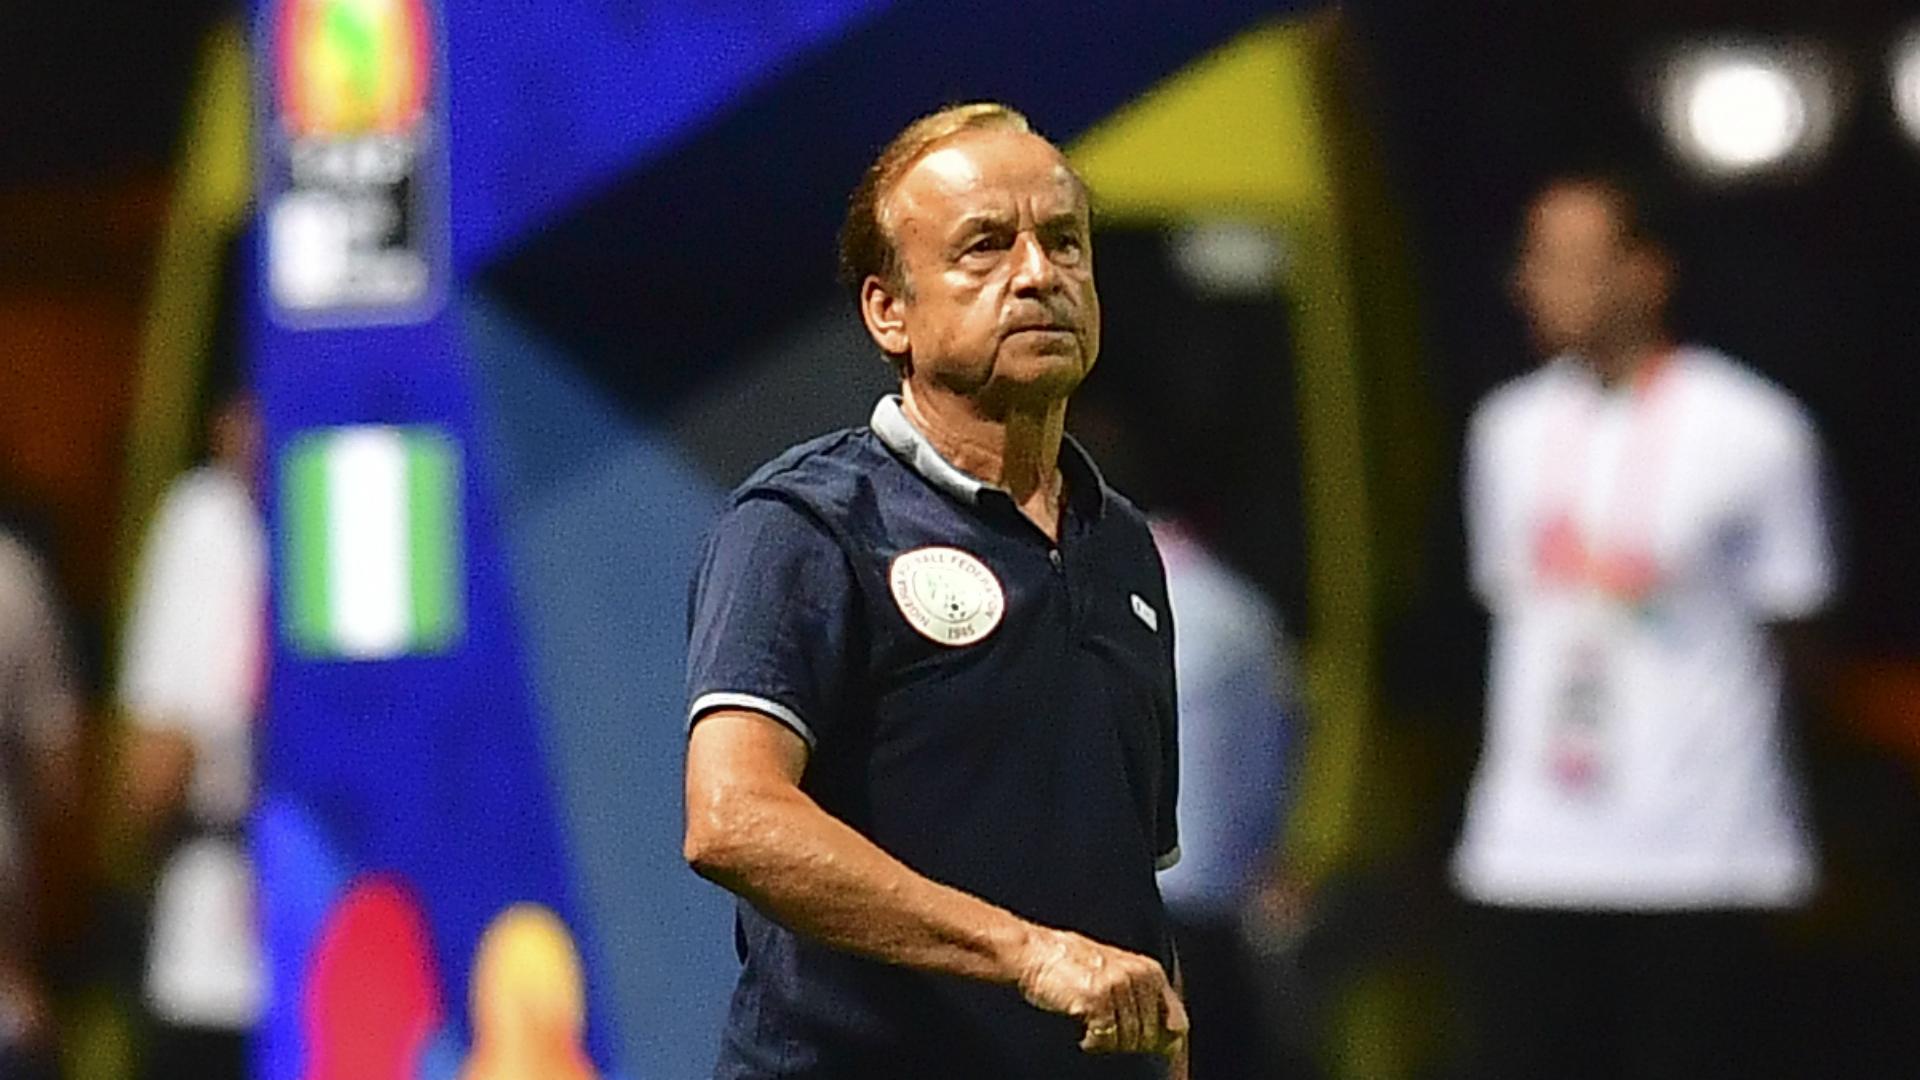 Super Eagles coach Rohr talks up importance of Cameroon friendlies